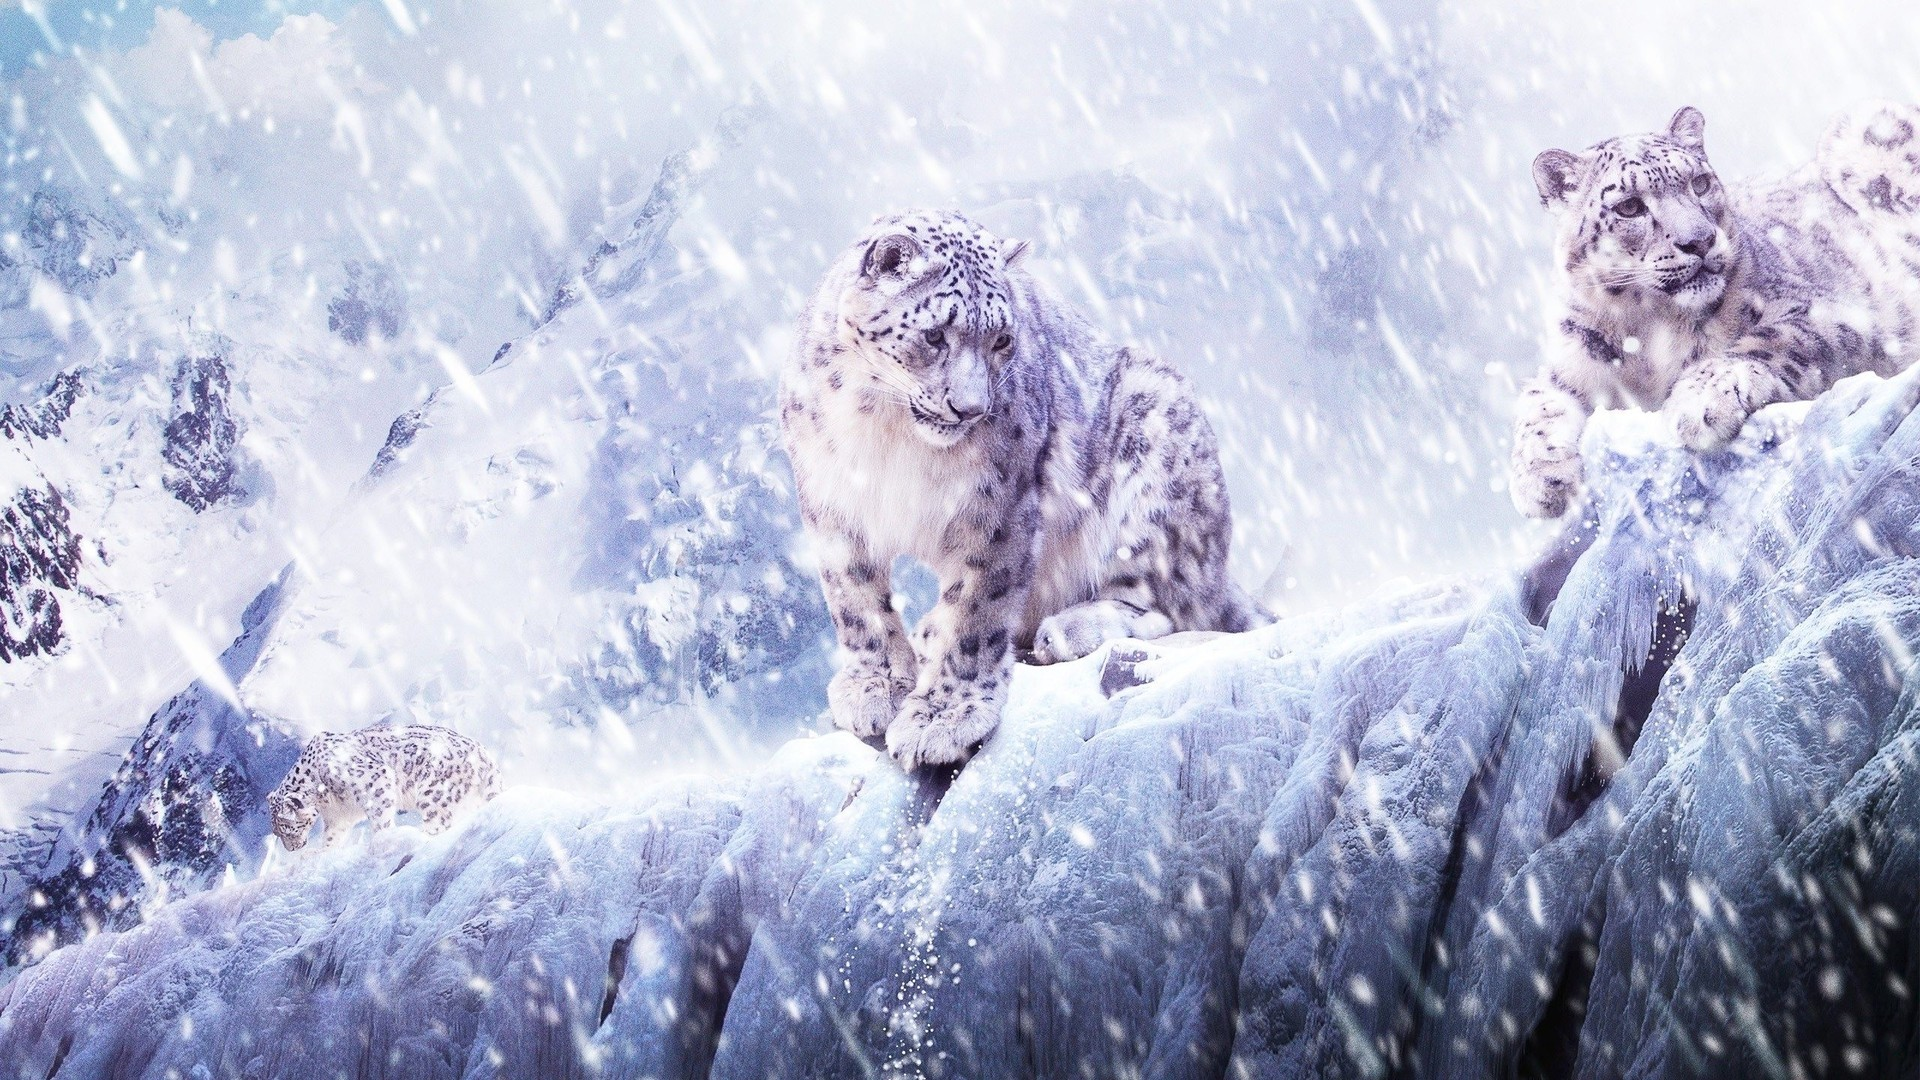 mac wallpaper snow leopard 64 images